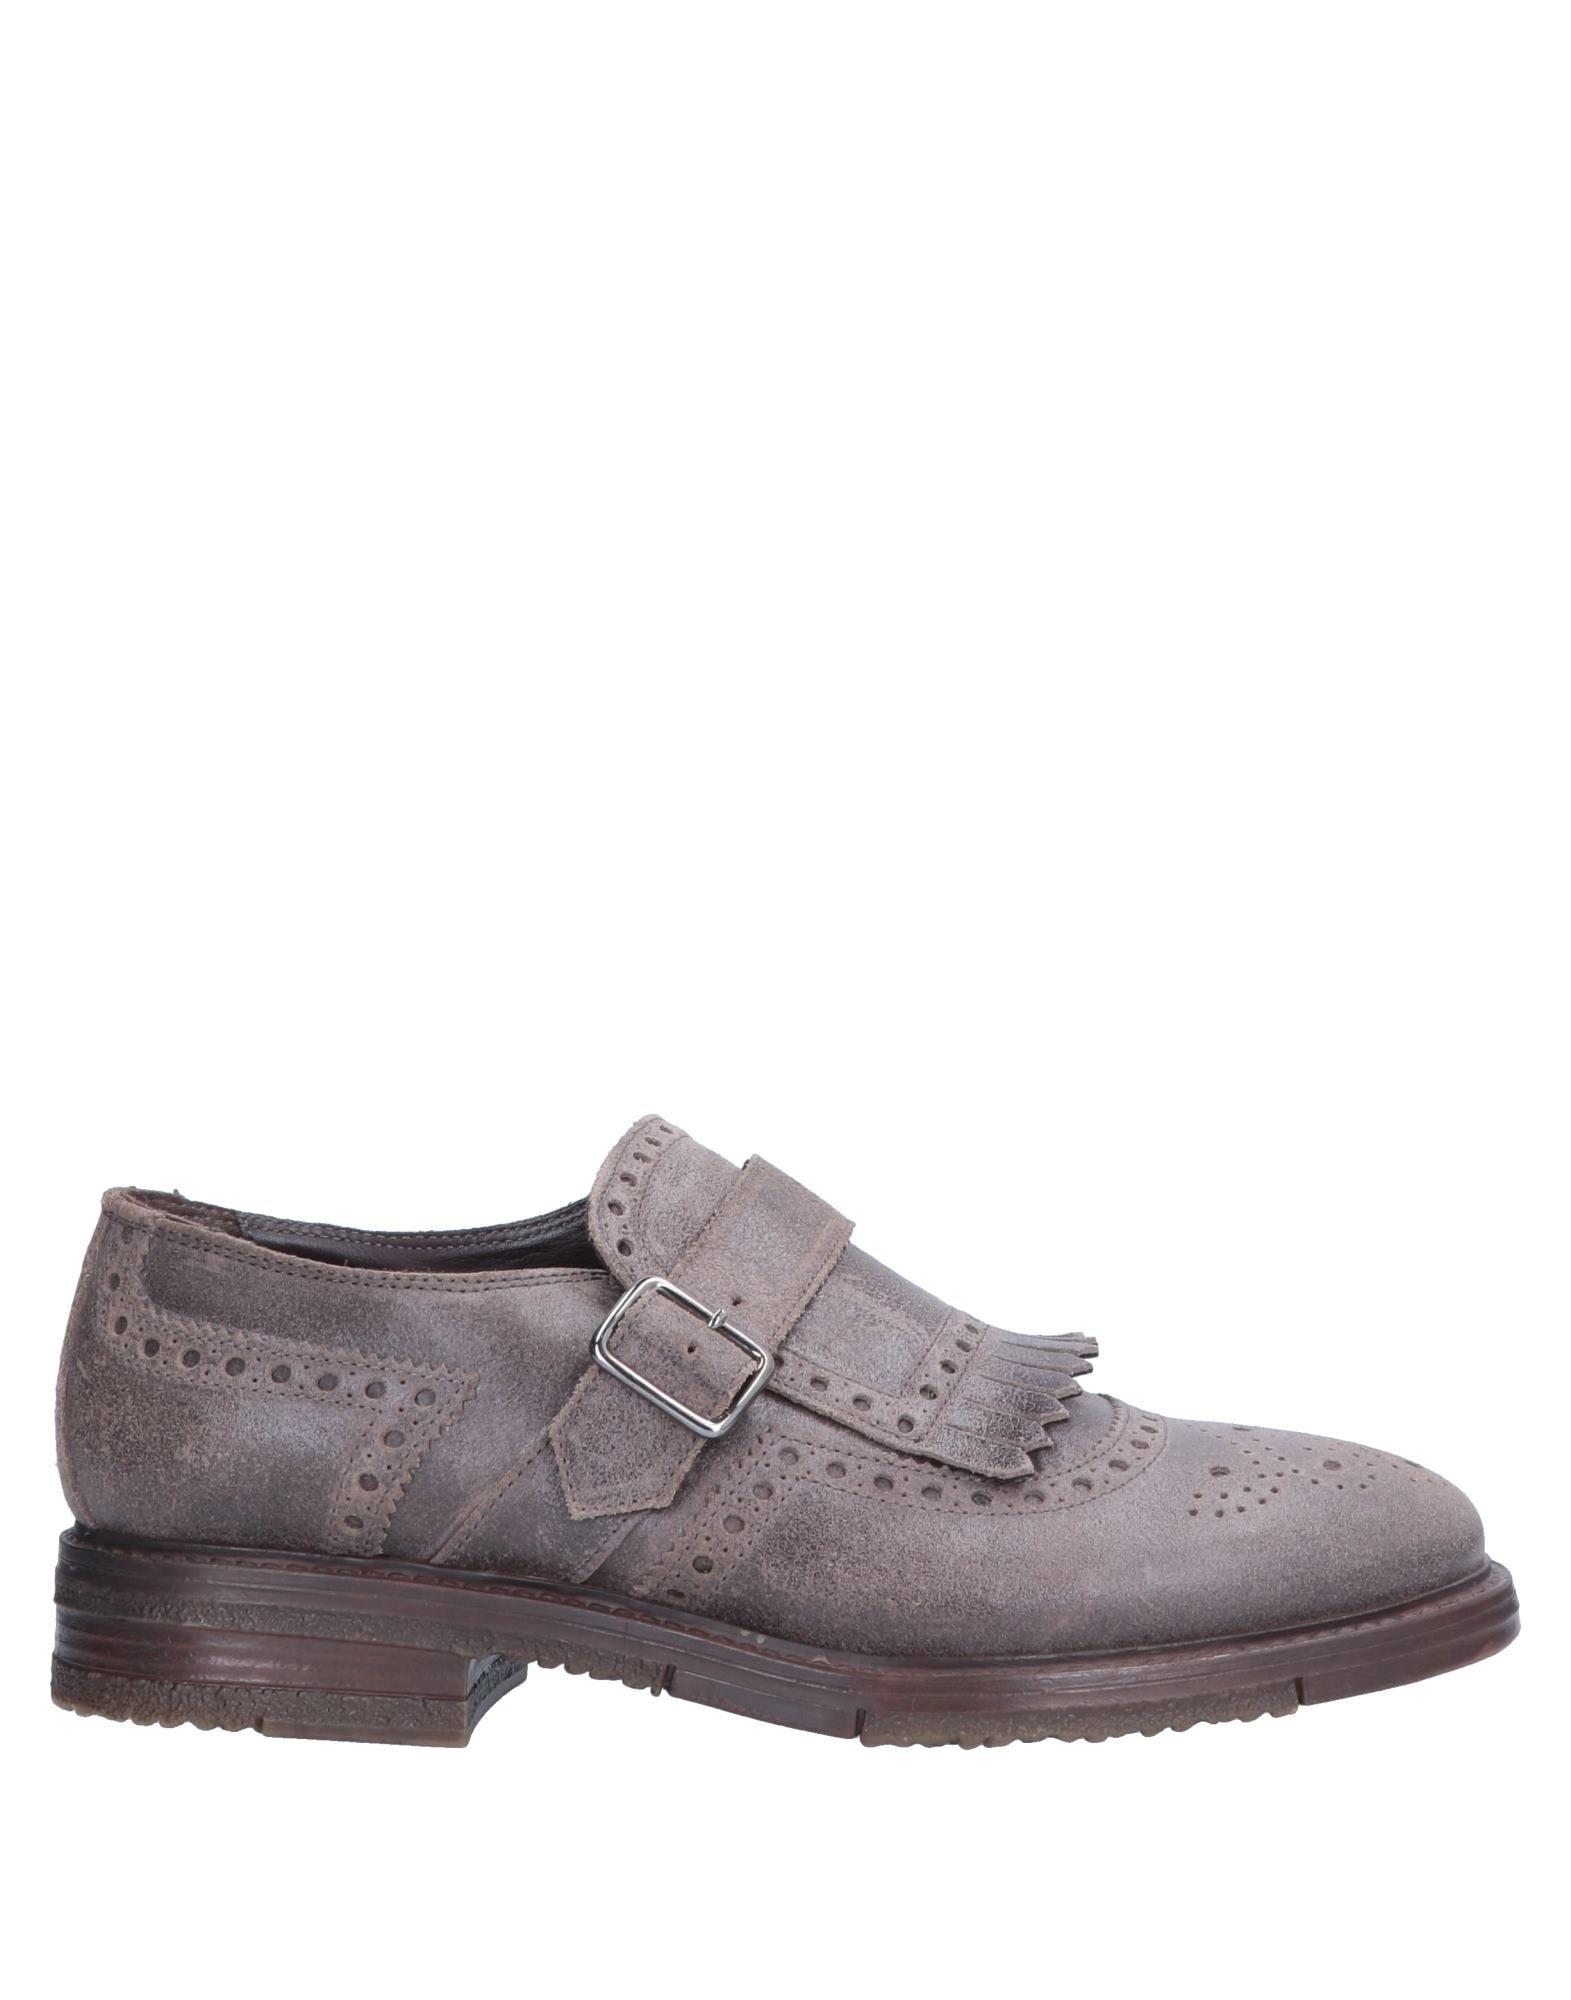 Antica Cuoieria Loafers - Men on Antica Cuoieria Loafers online on Men  Canada - 11556896SG d83806